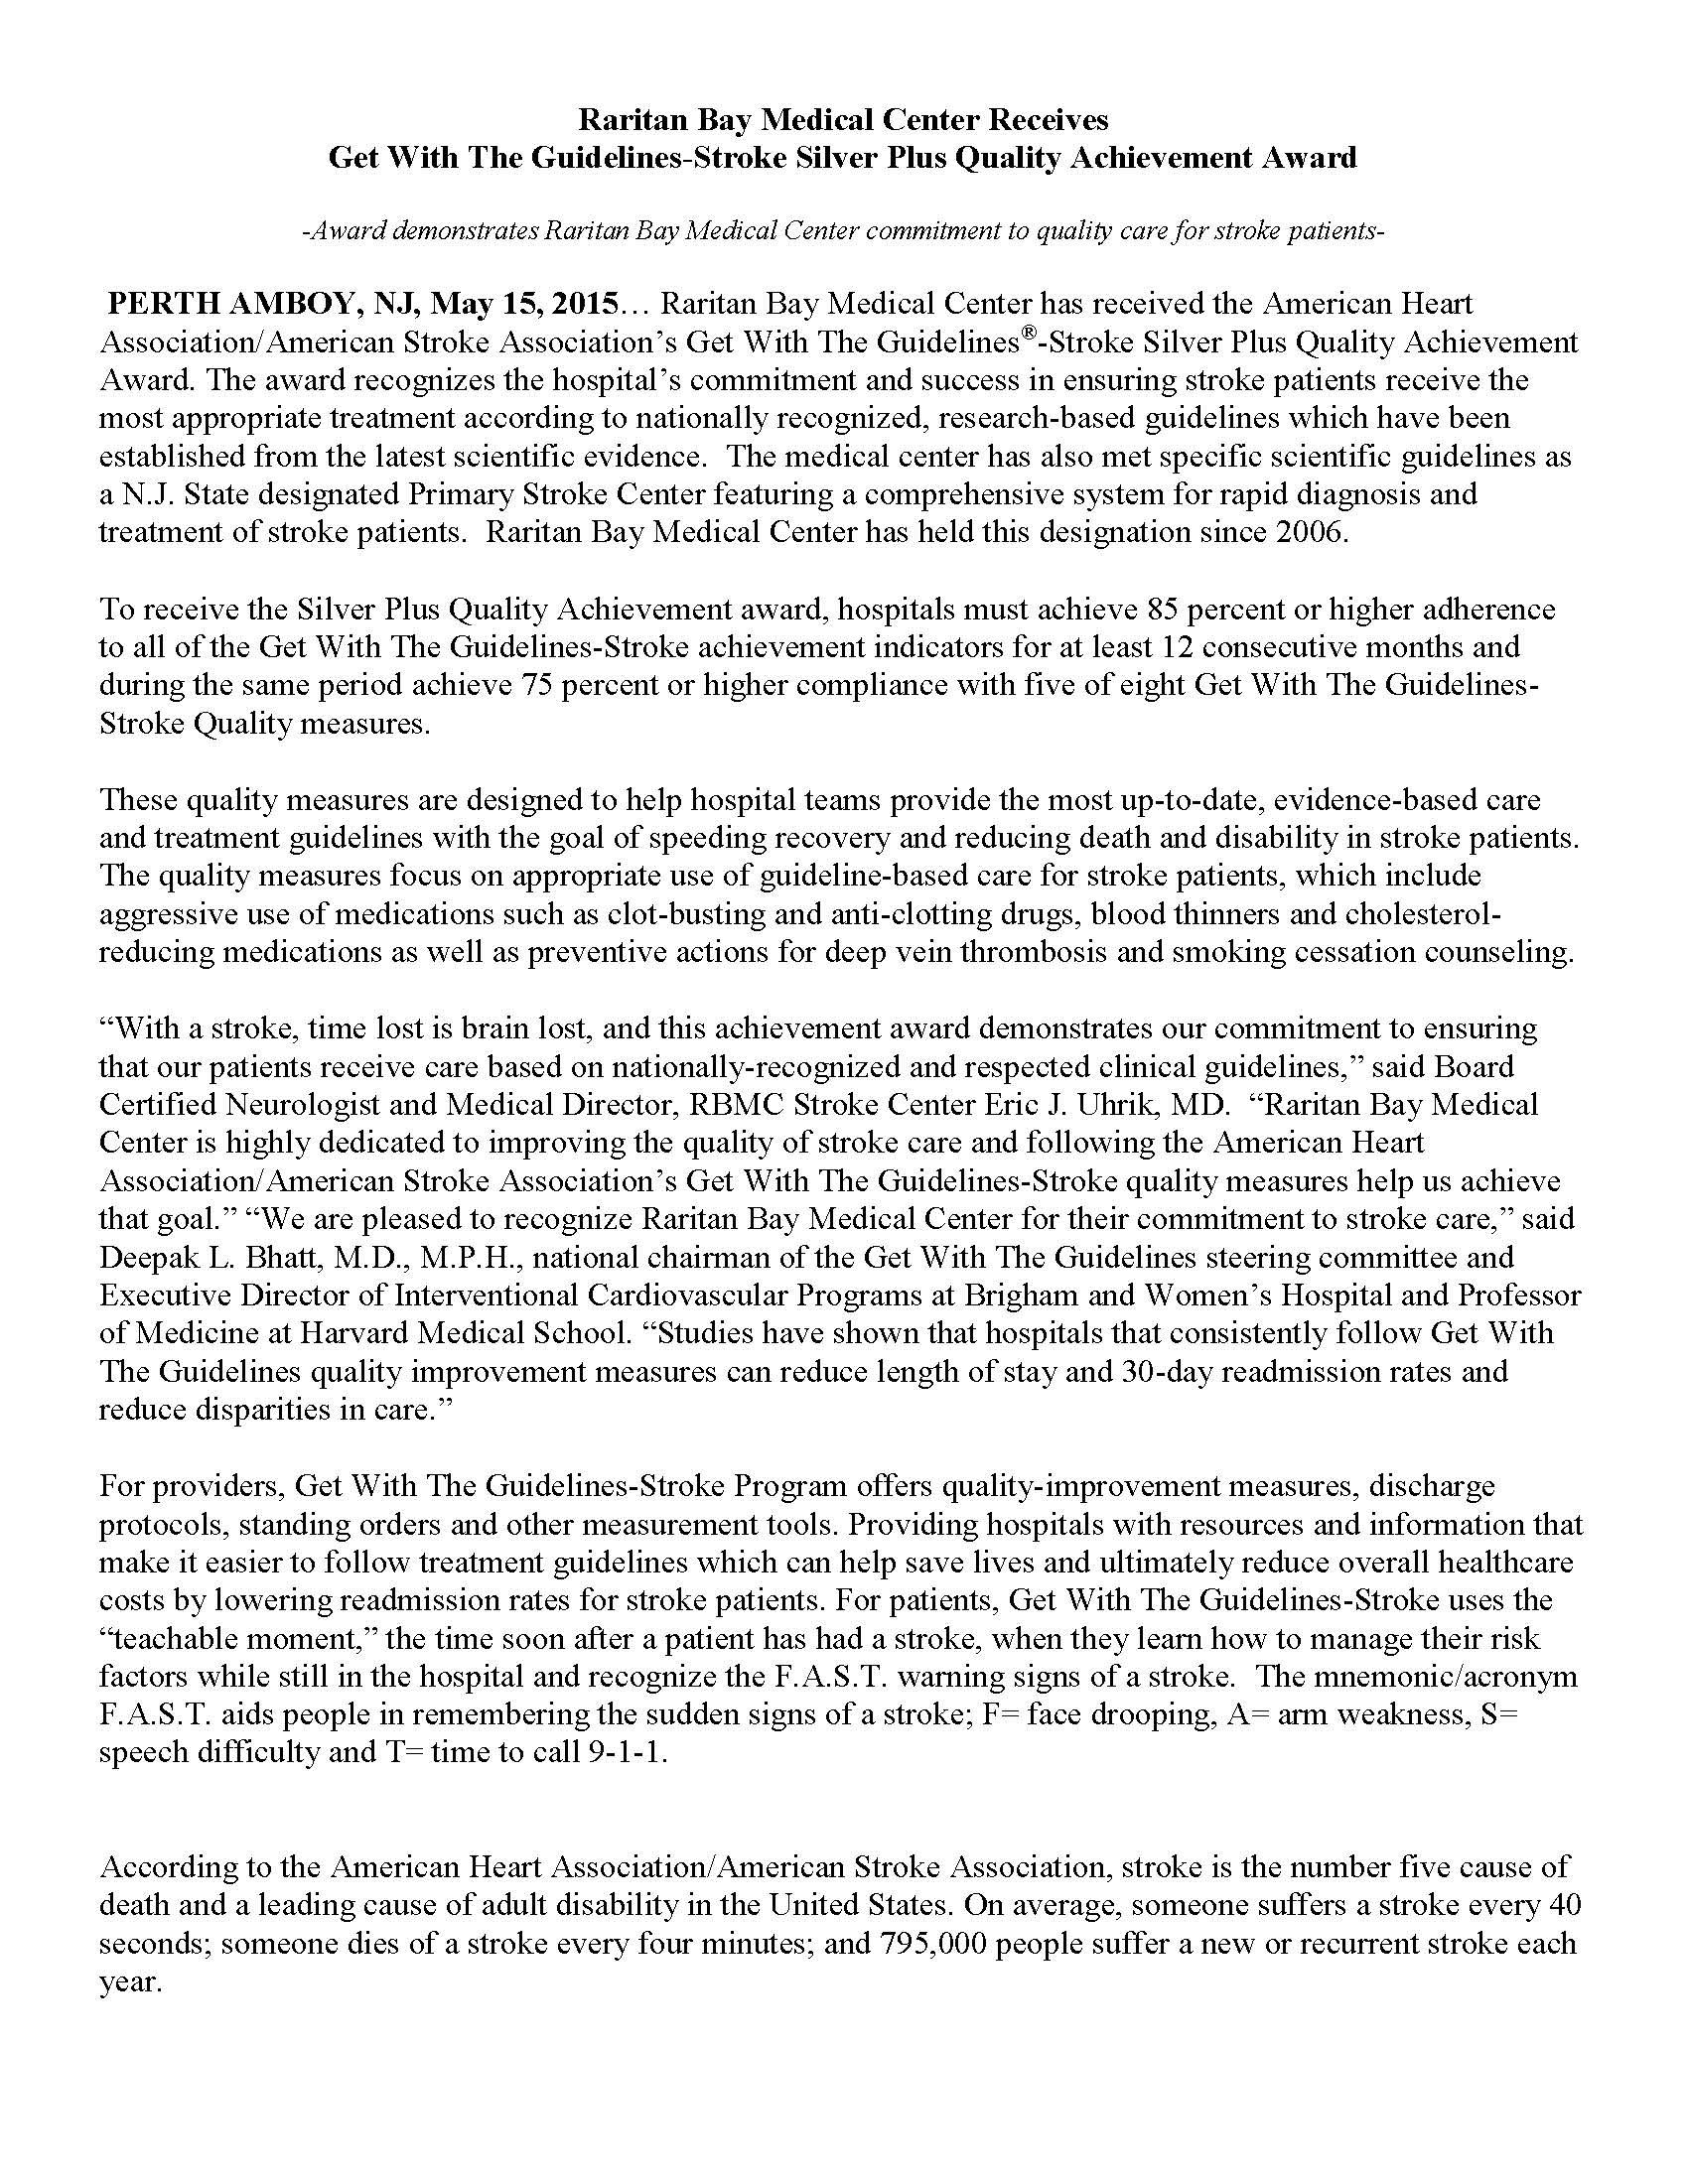 Imperial presidency essay